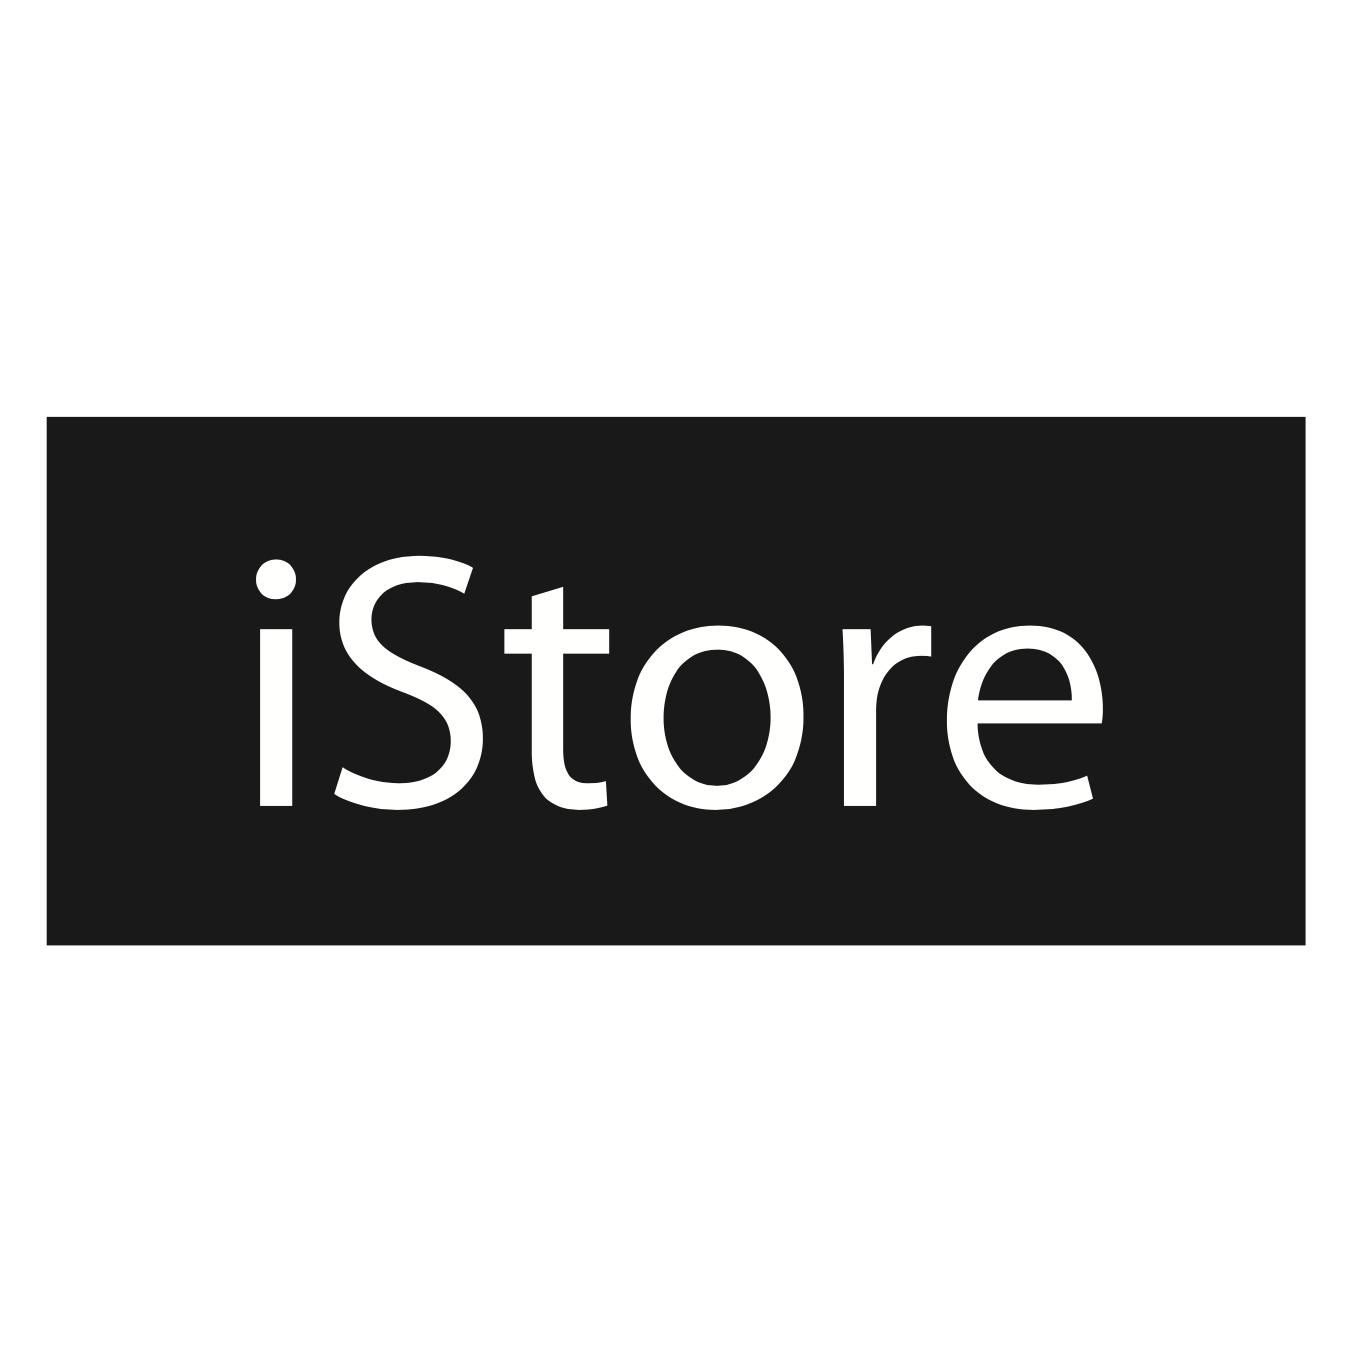 iPhone 7 Plus Silicone Case - Cocoa